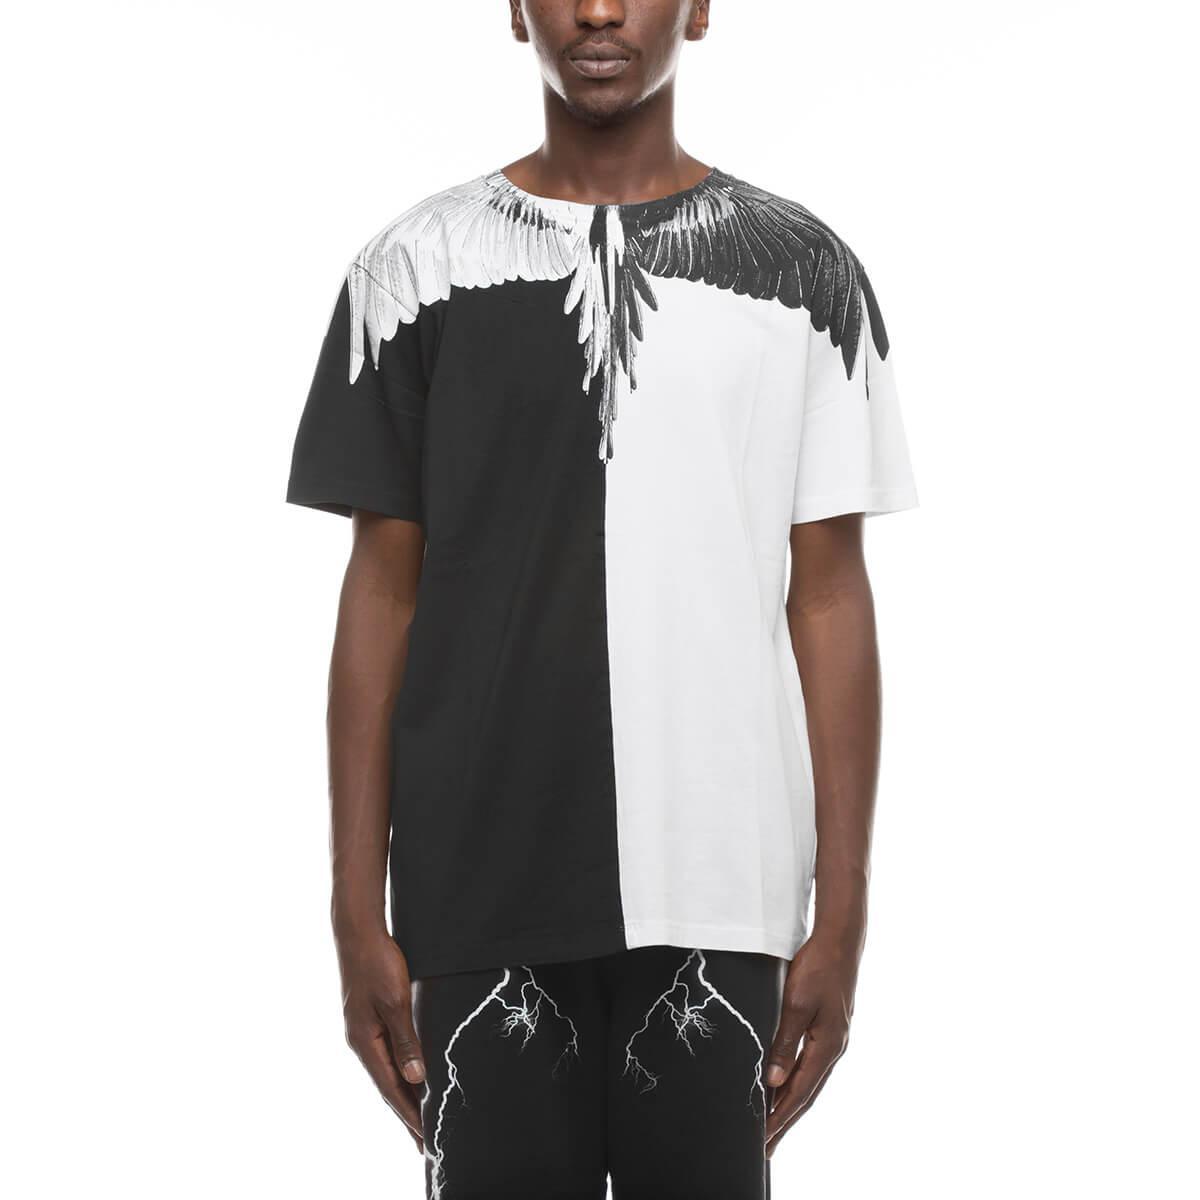 White and Black Aish T-Shirt Marcelo Burlon Really Sale Online 2018 New Online Outlet Sale 8vhUBs3m